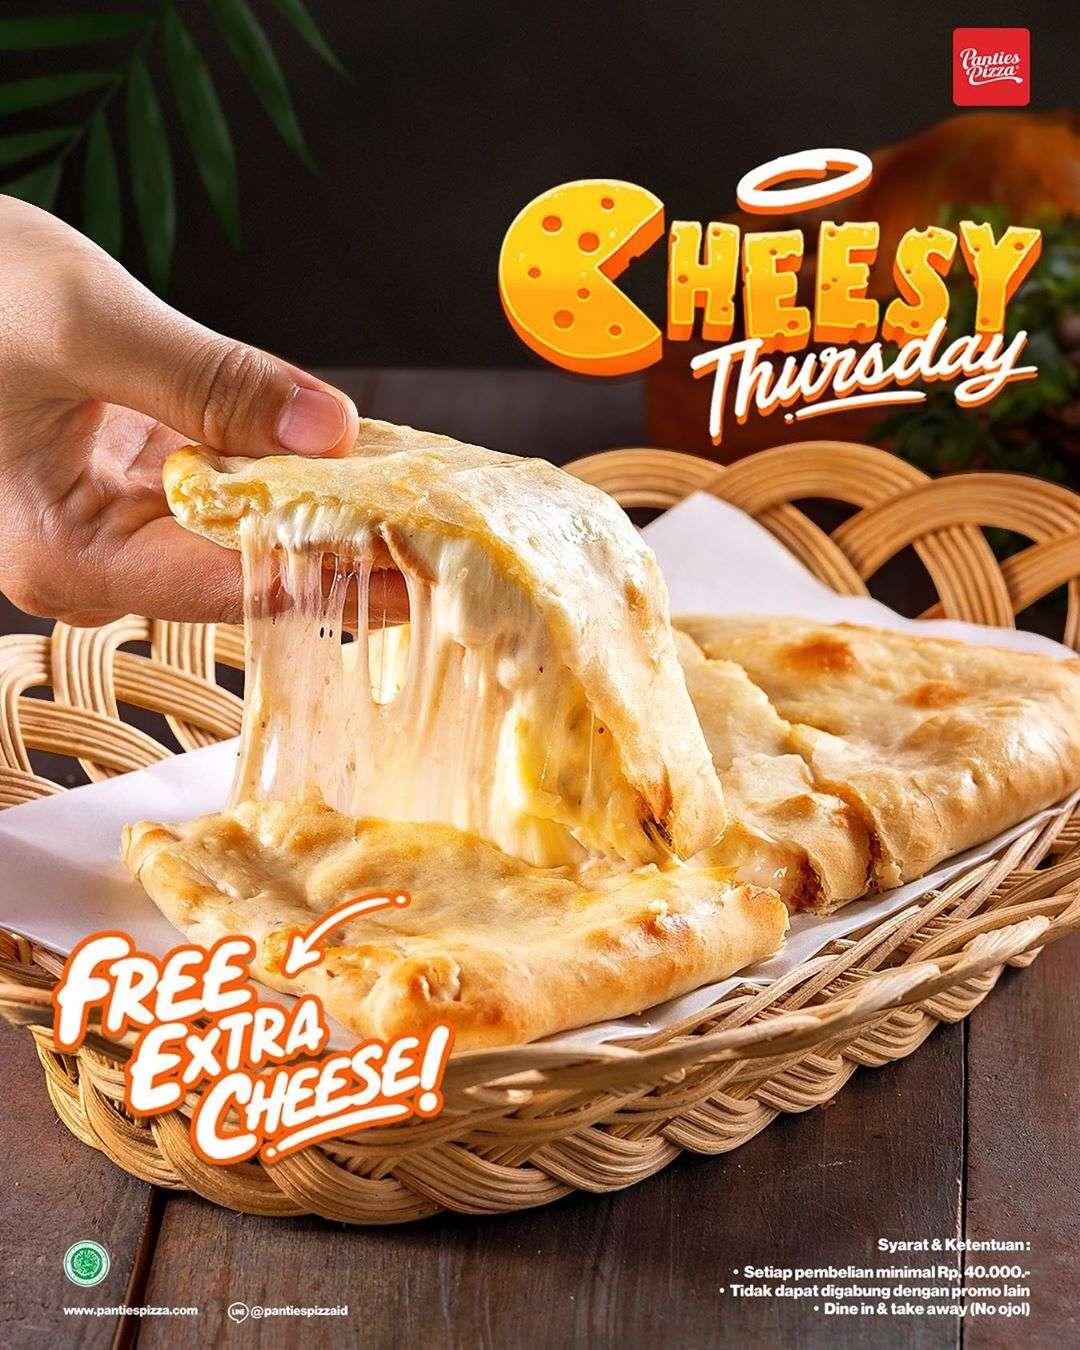 Diskon Promo Panties Pizza Gratis Extra Cheese Setiap Hari Kamis